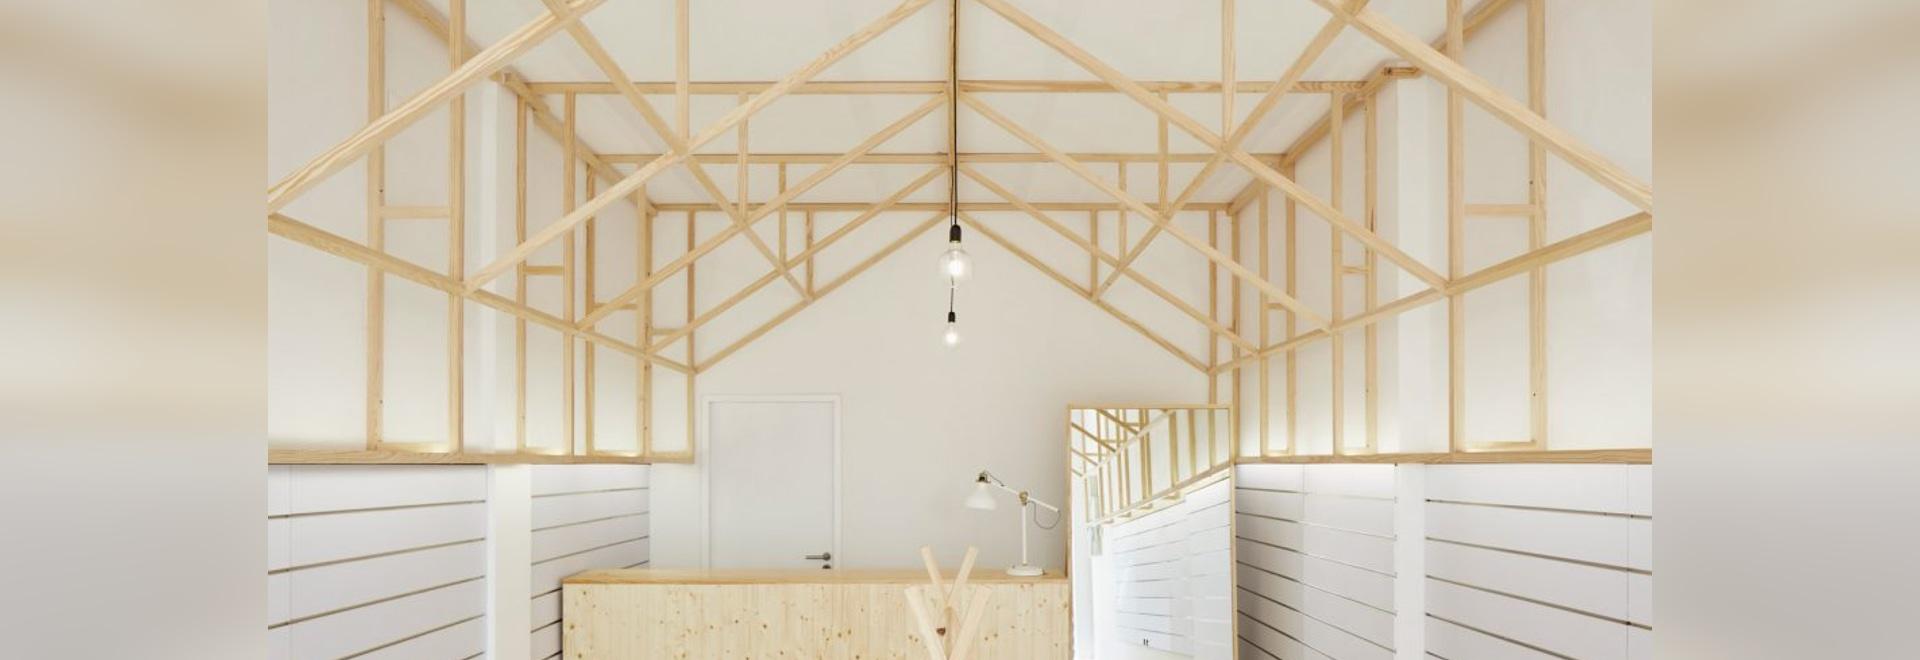 Bruno Lucas Dias adds timber skeleton to Portuguese accessories boutique